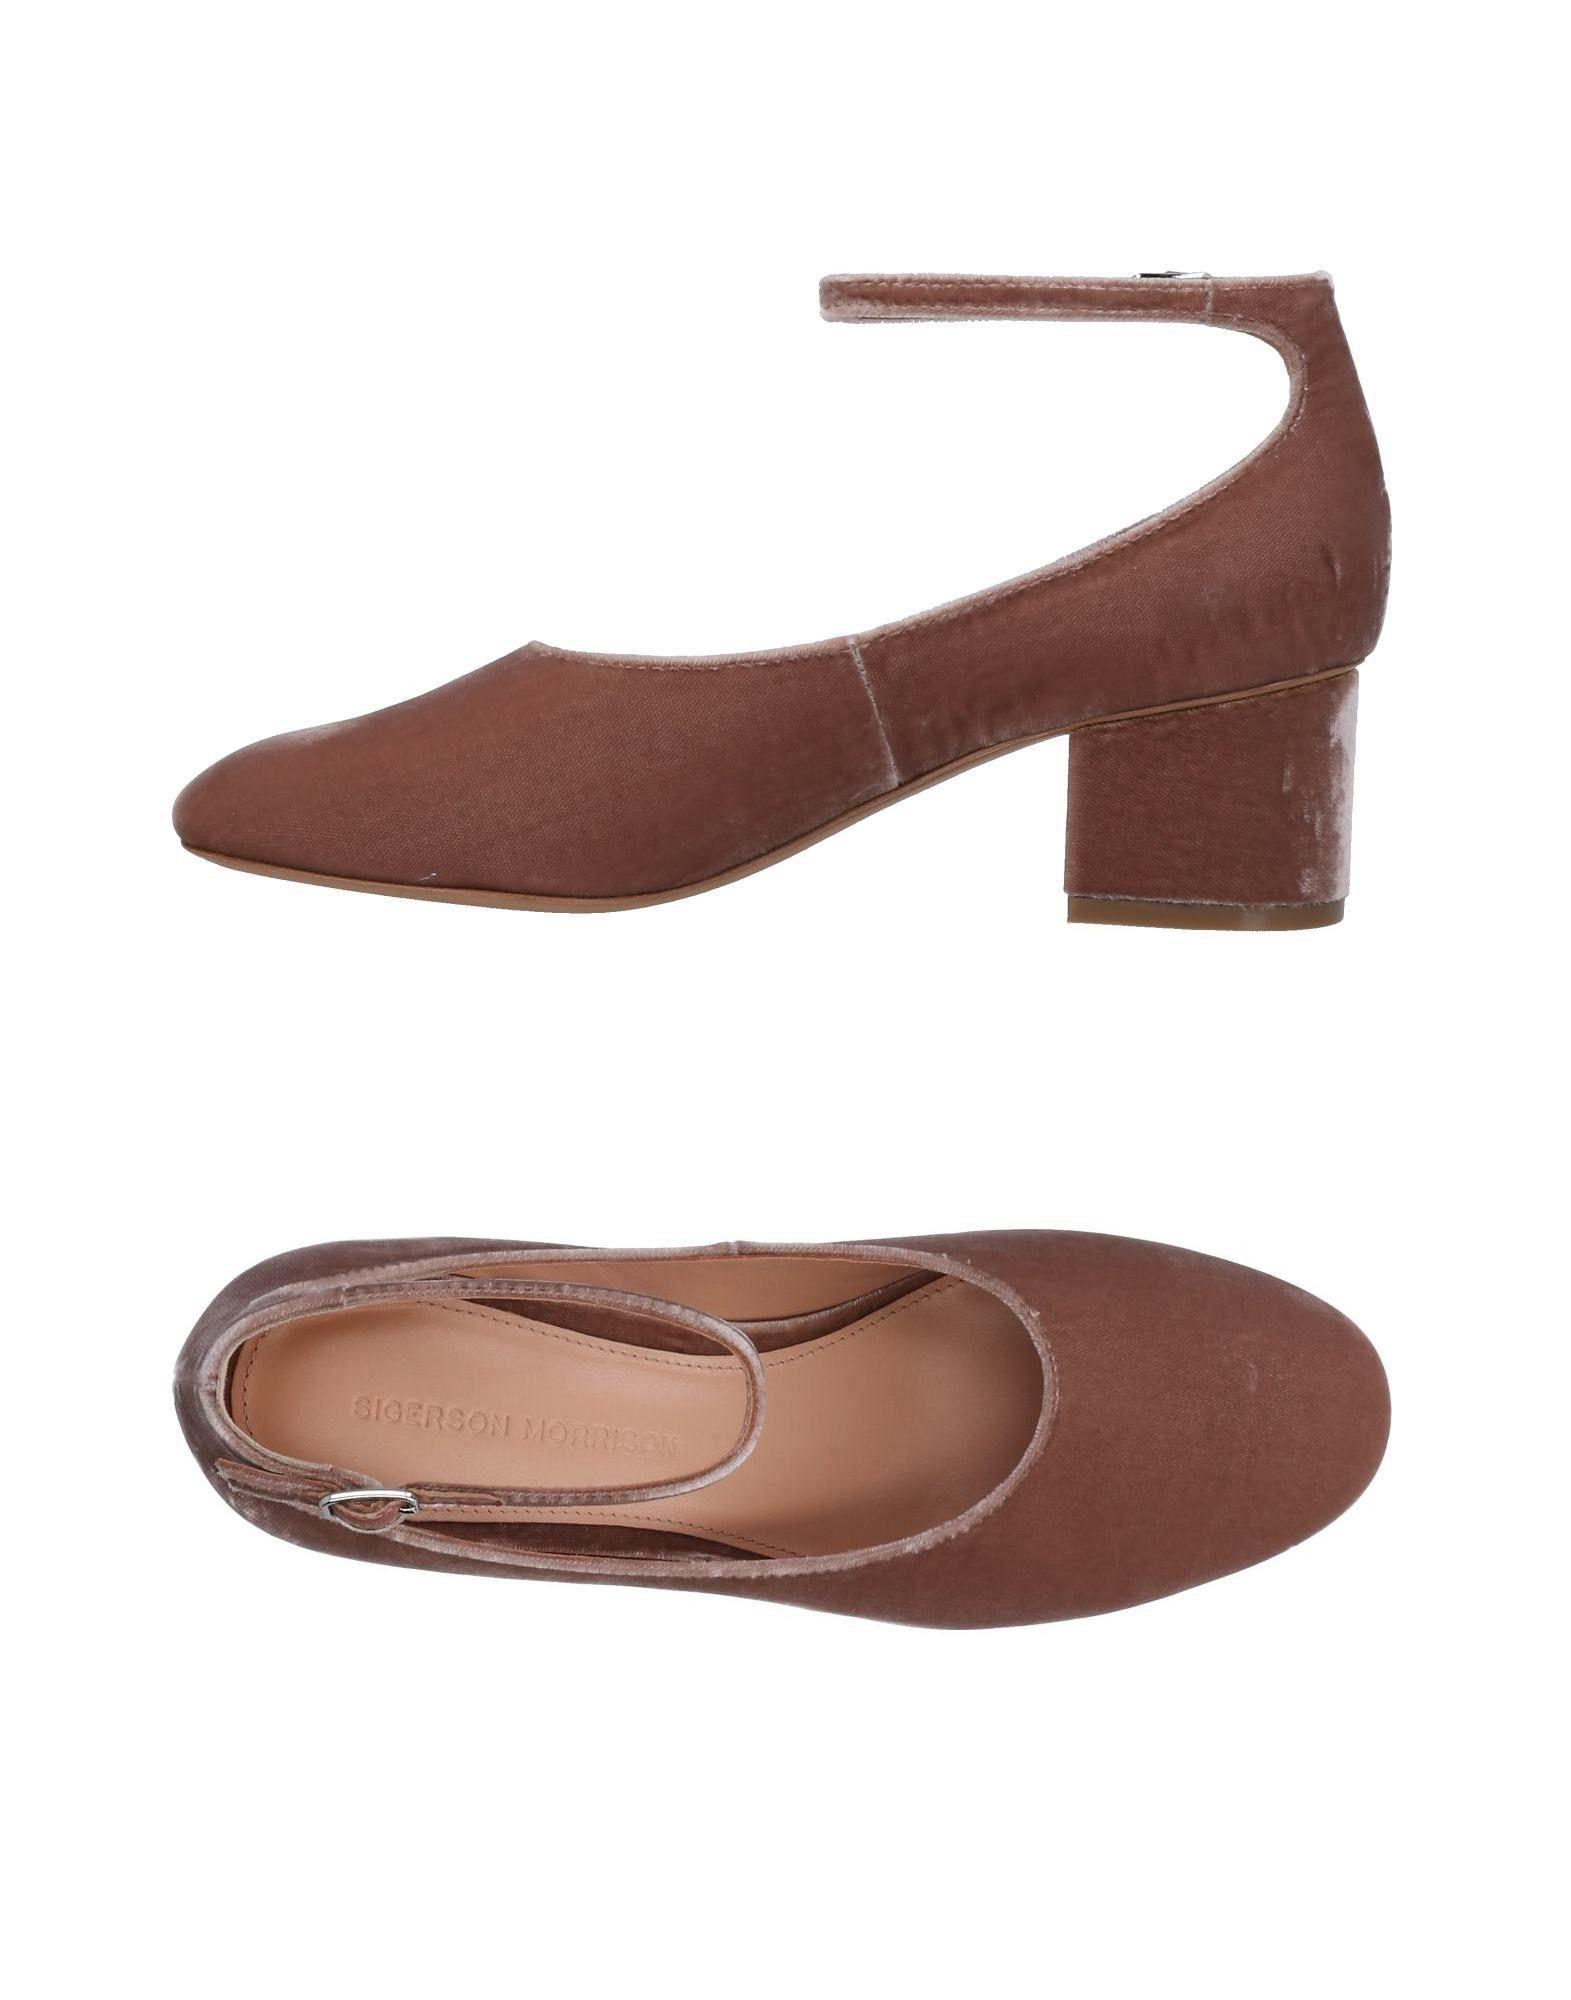 SIGERSON MORRISON Туфли цены онлайн